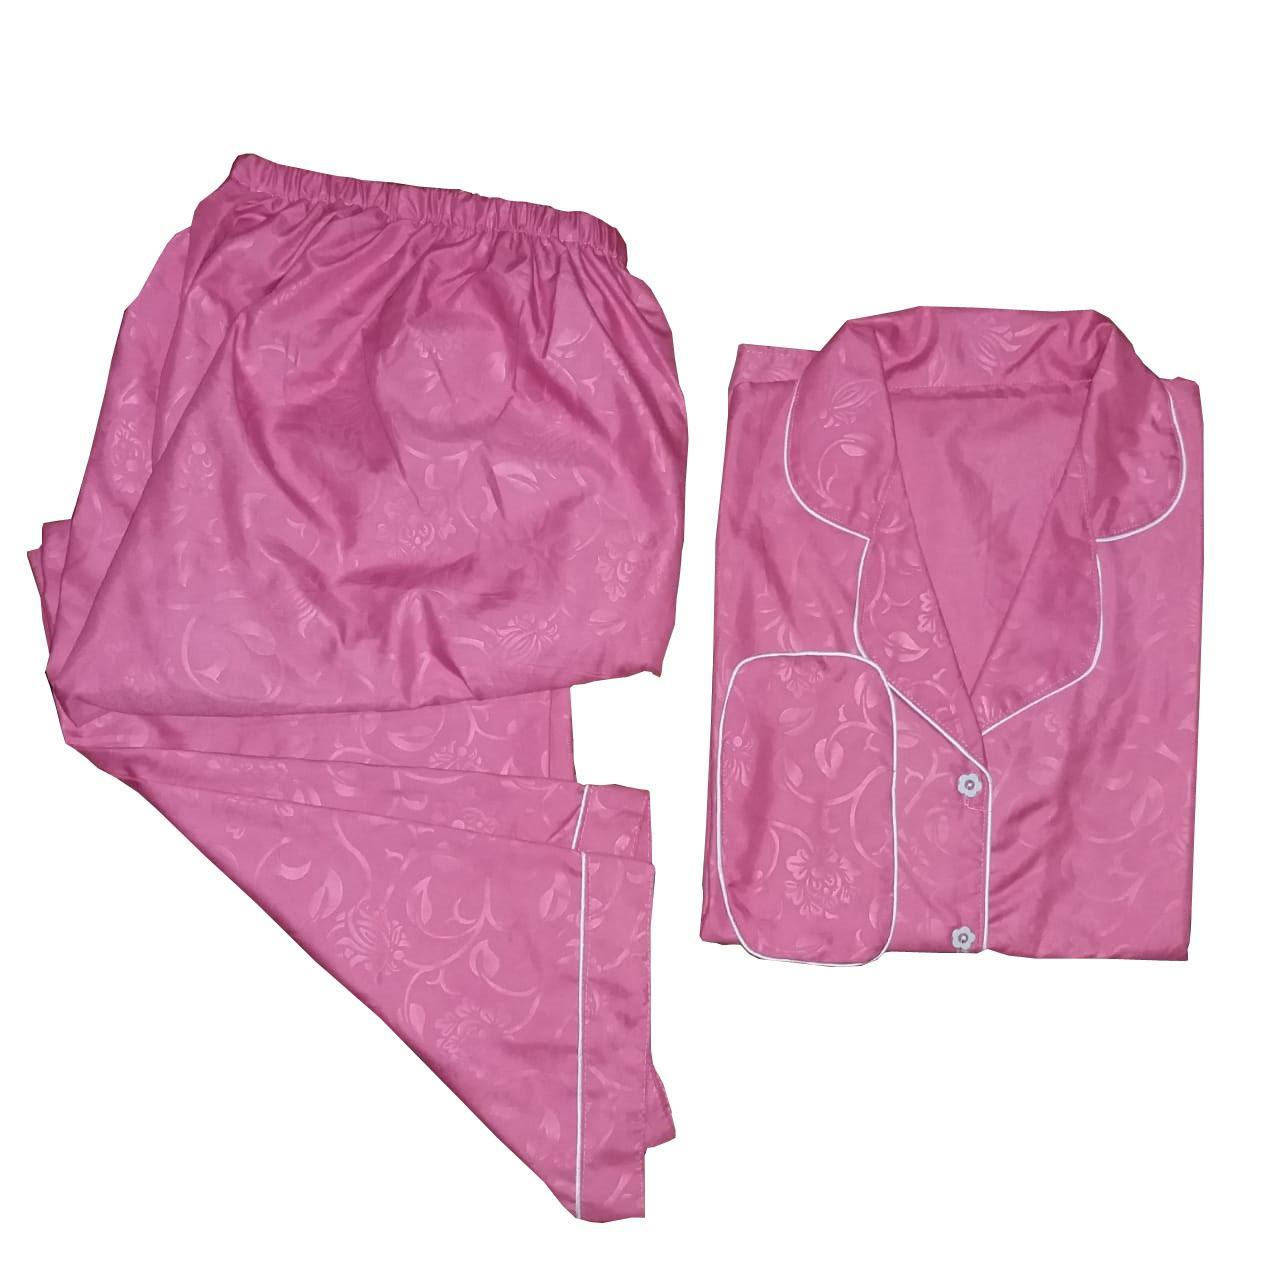 piyama baju bobok piyama baju tidur terlaris-baju tidur ter update-s'cokey/ baju tidur/pakaian tidur wanita/ pakaian wanita/ pakaian fashion wanita/ baju piama/ bajua santai wanita.